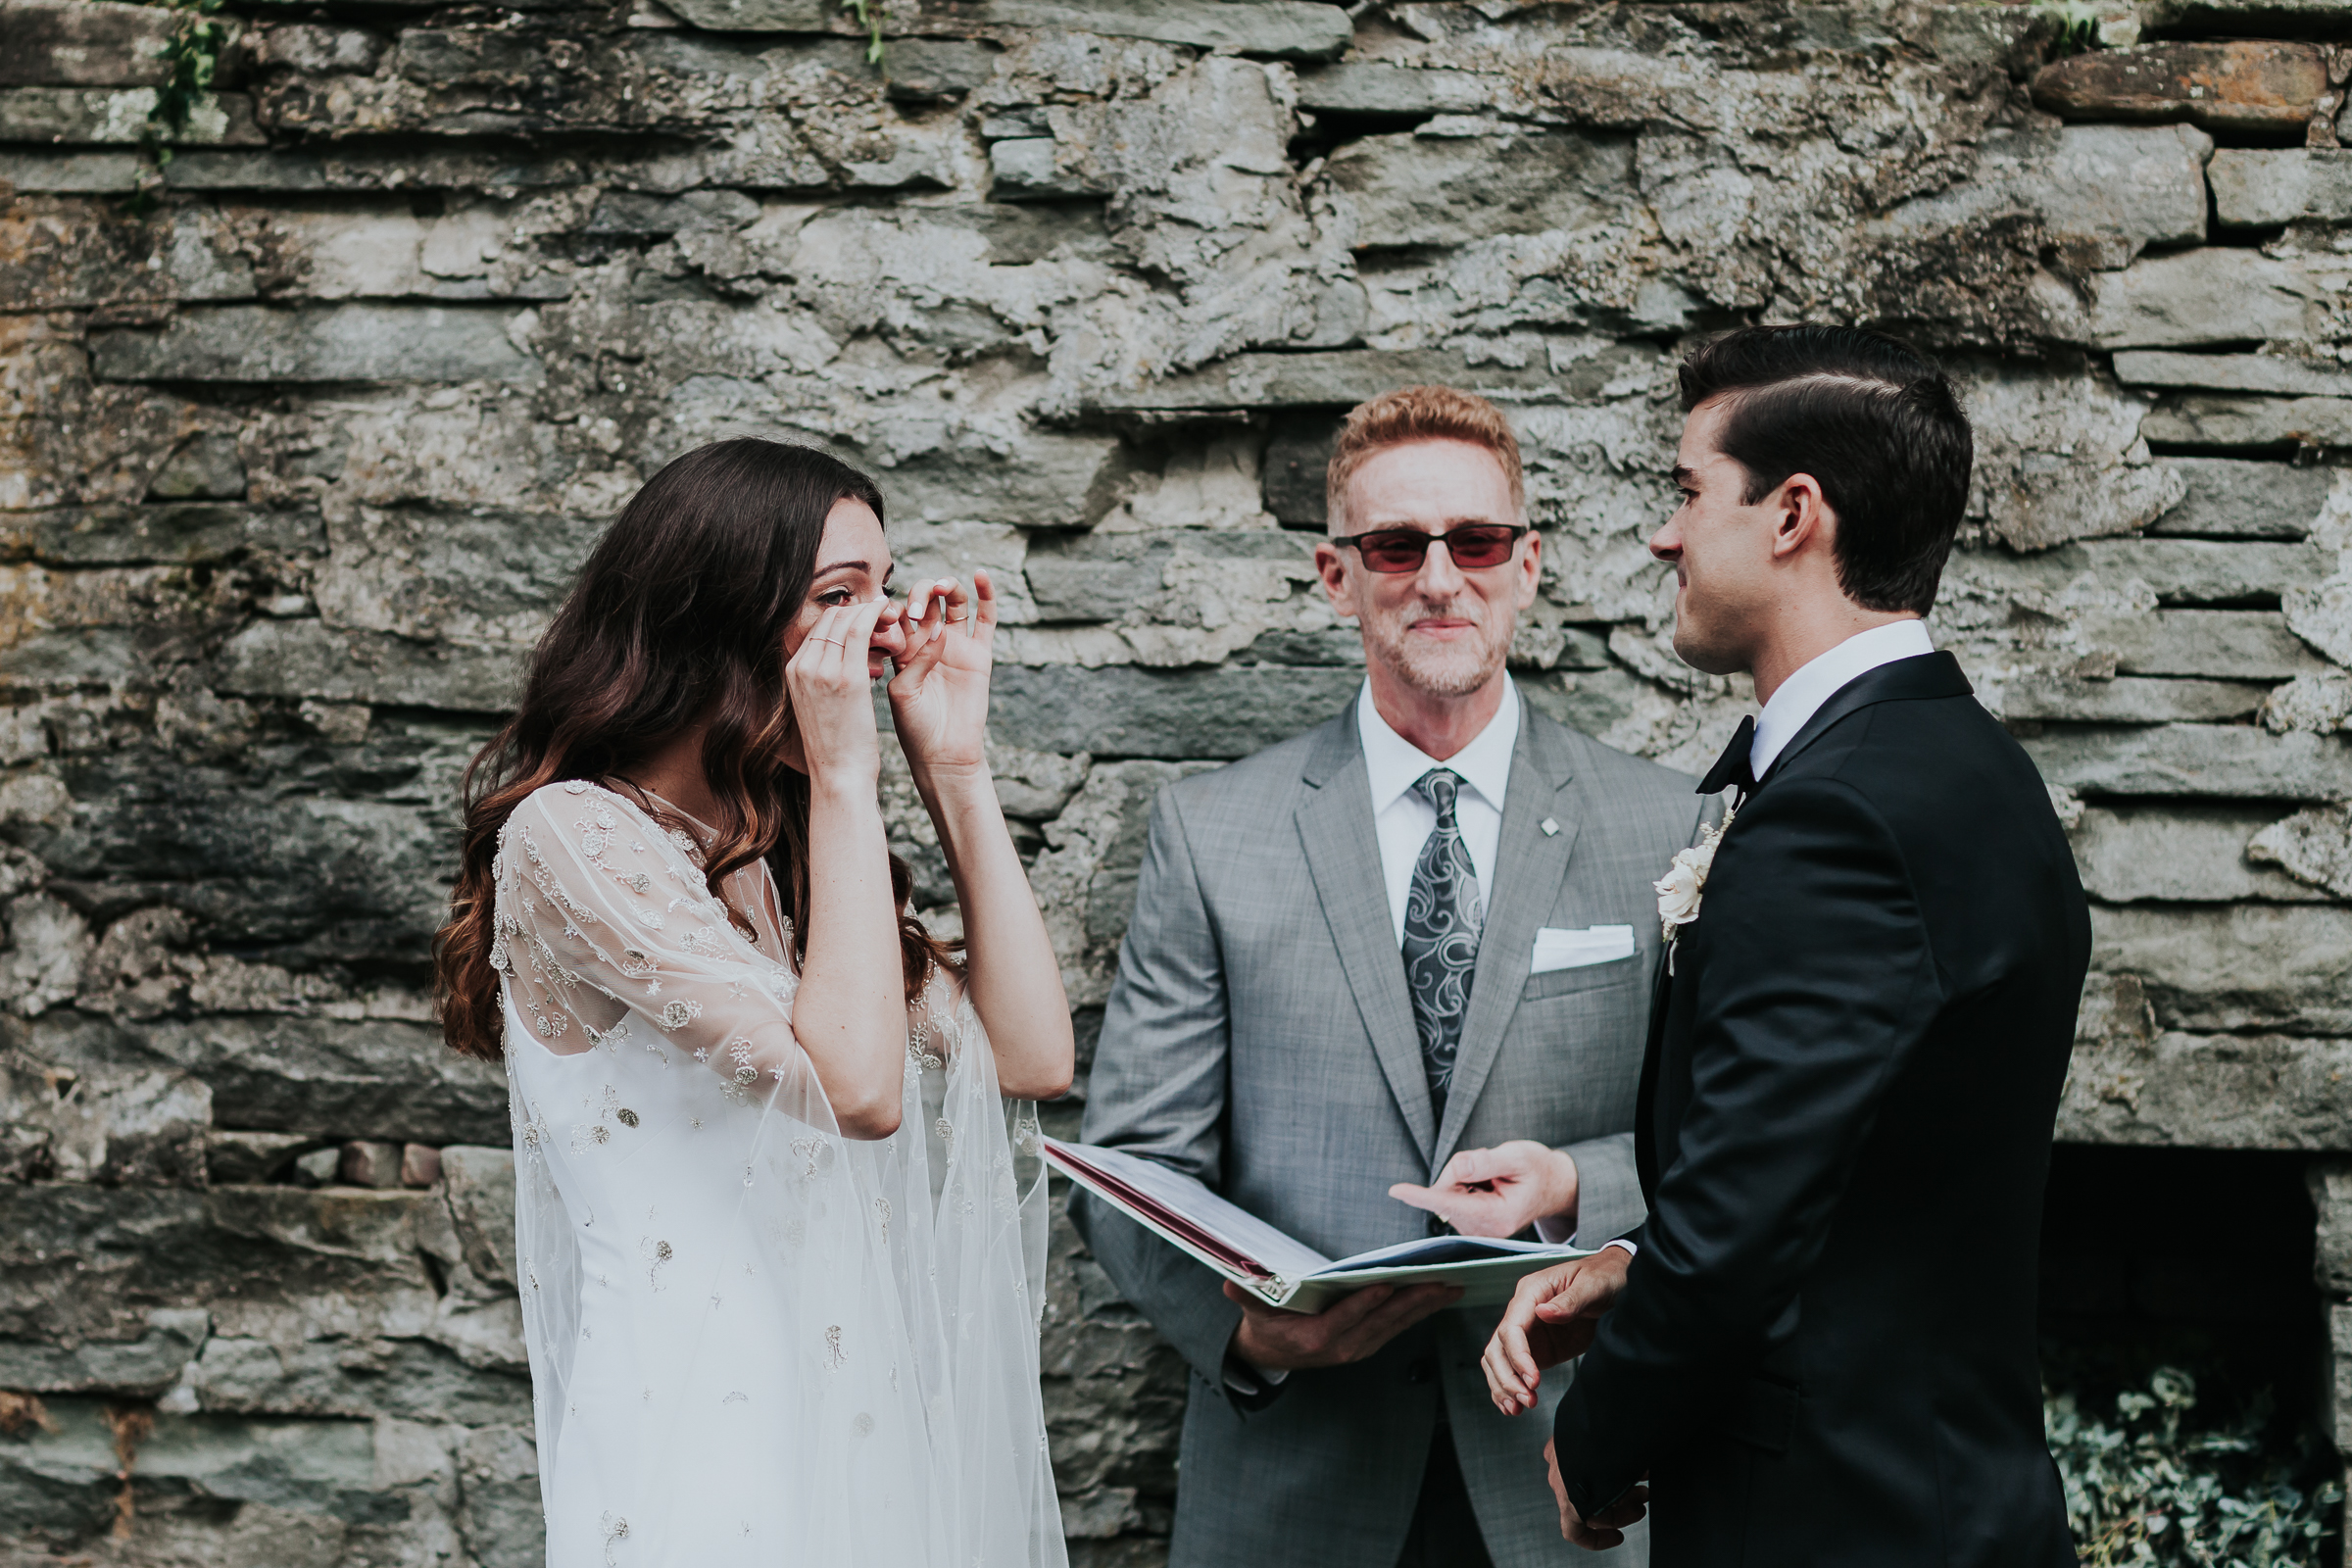 Handsome-Hollow-Long-Eddy-Catskills-New-York-Fine-Art-Documentary-Wedding-Photographer-70.jpg